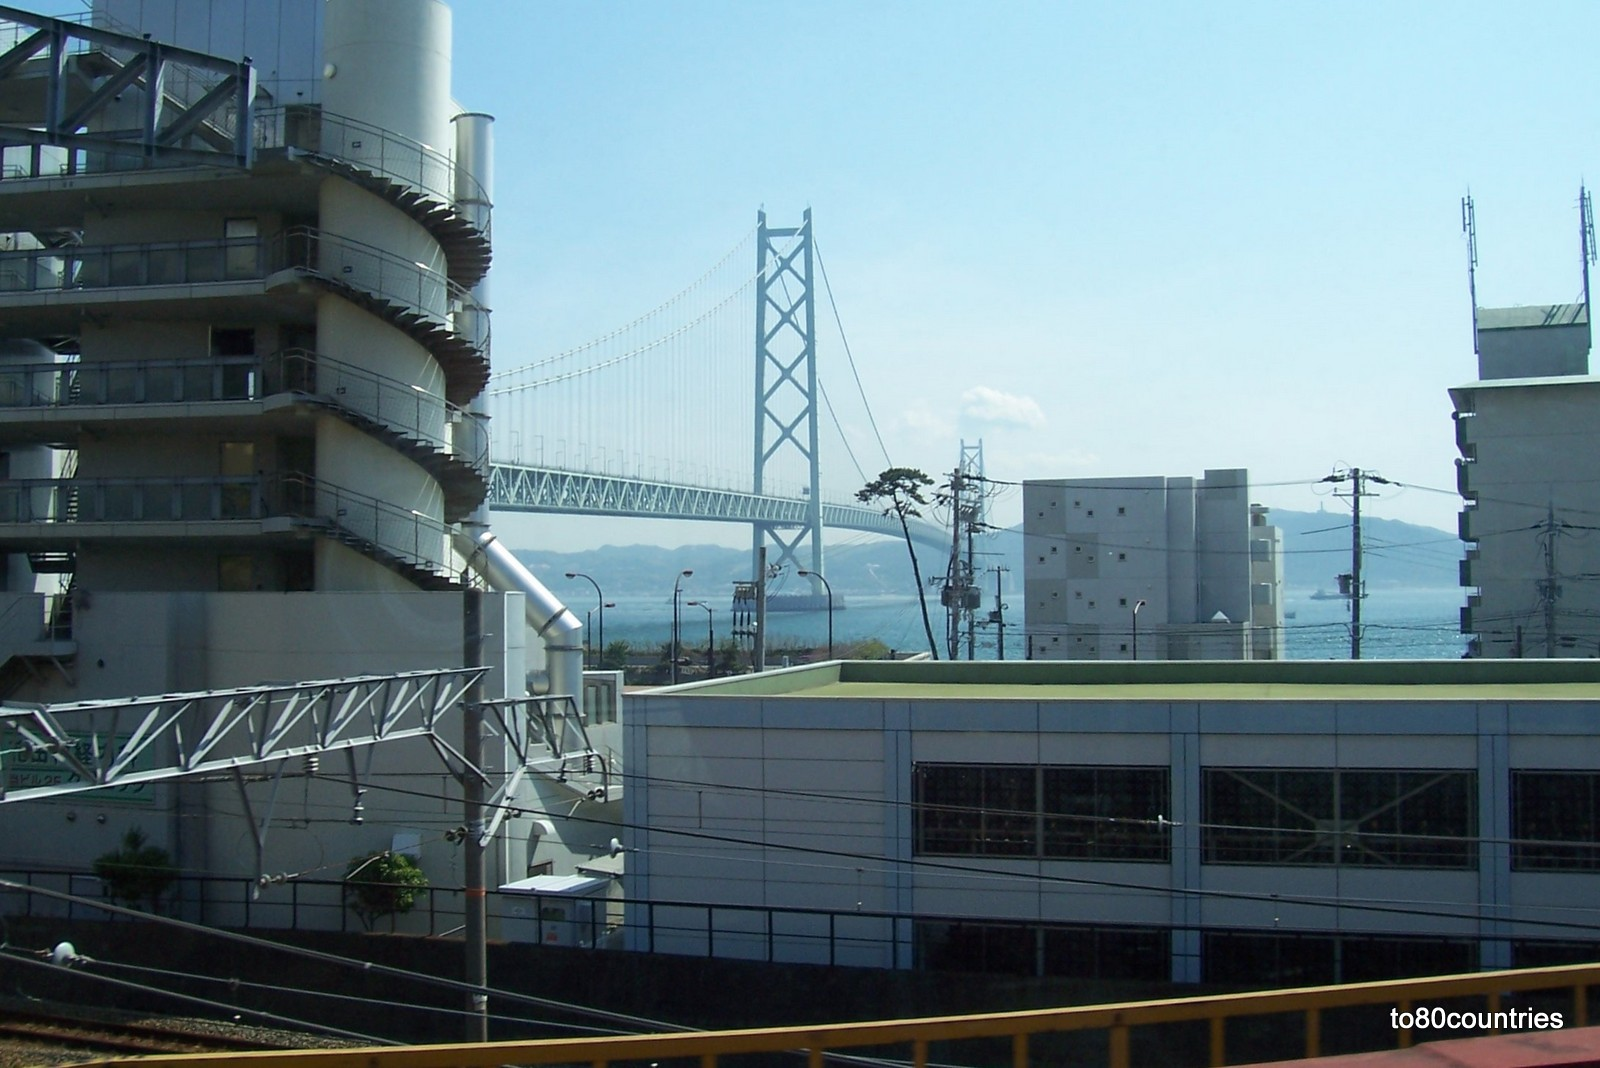 Akashi-Kaikyō-Brücke/ Honshu - Awaji-Shima